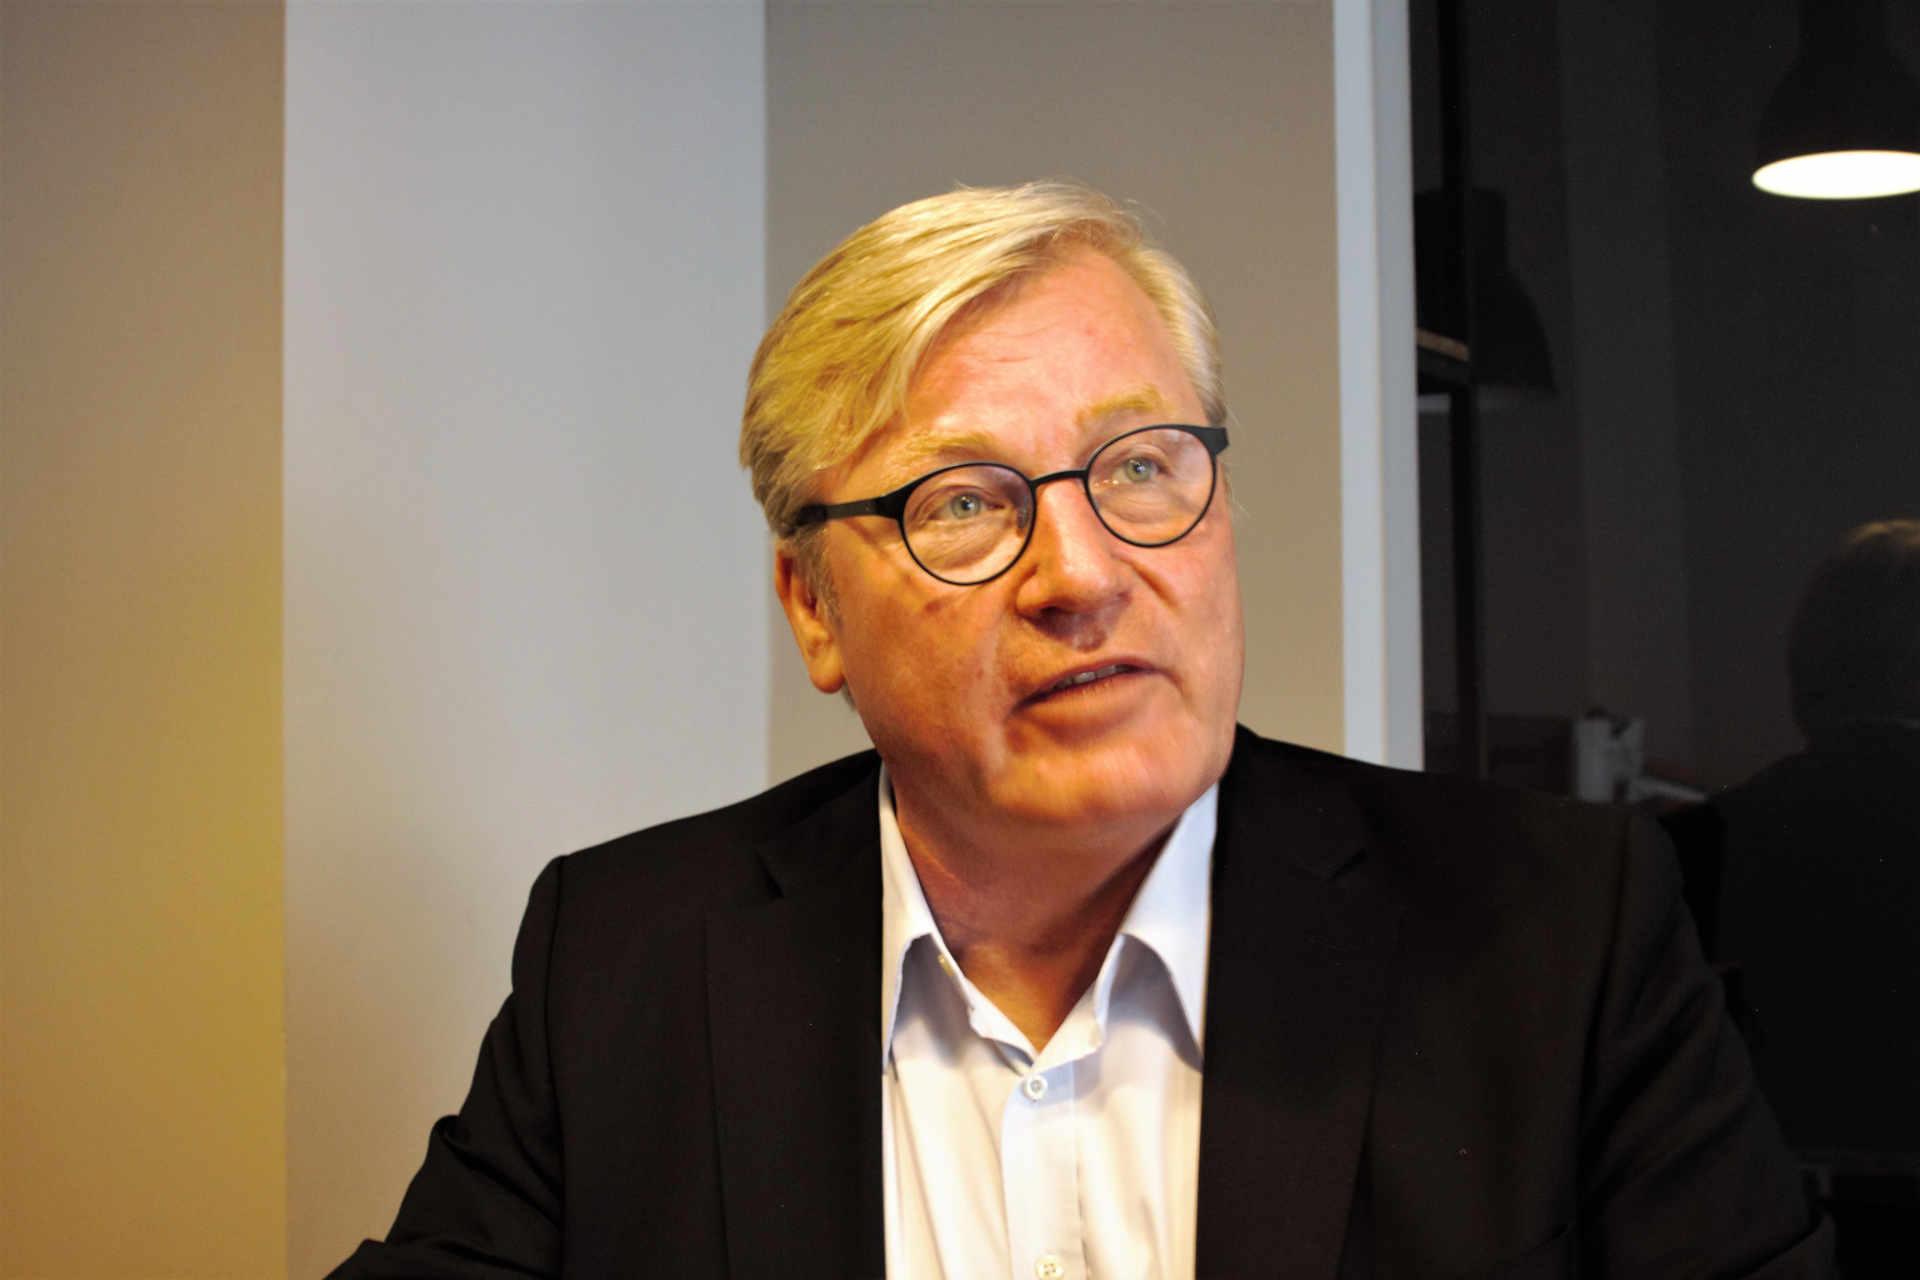 Bernd Althusman